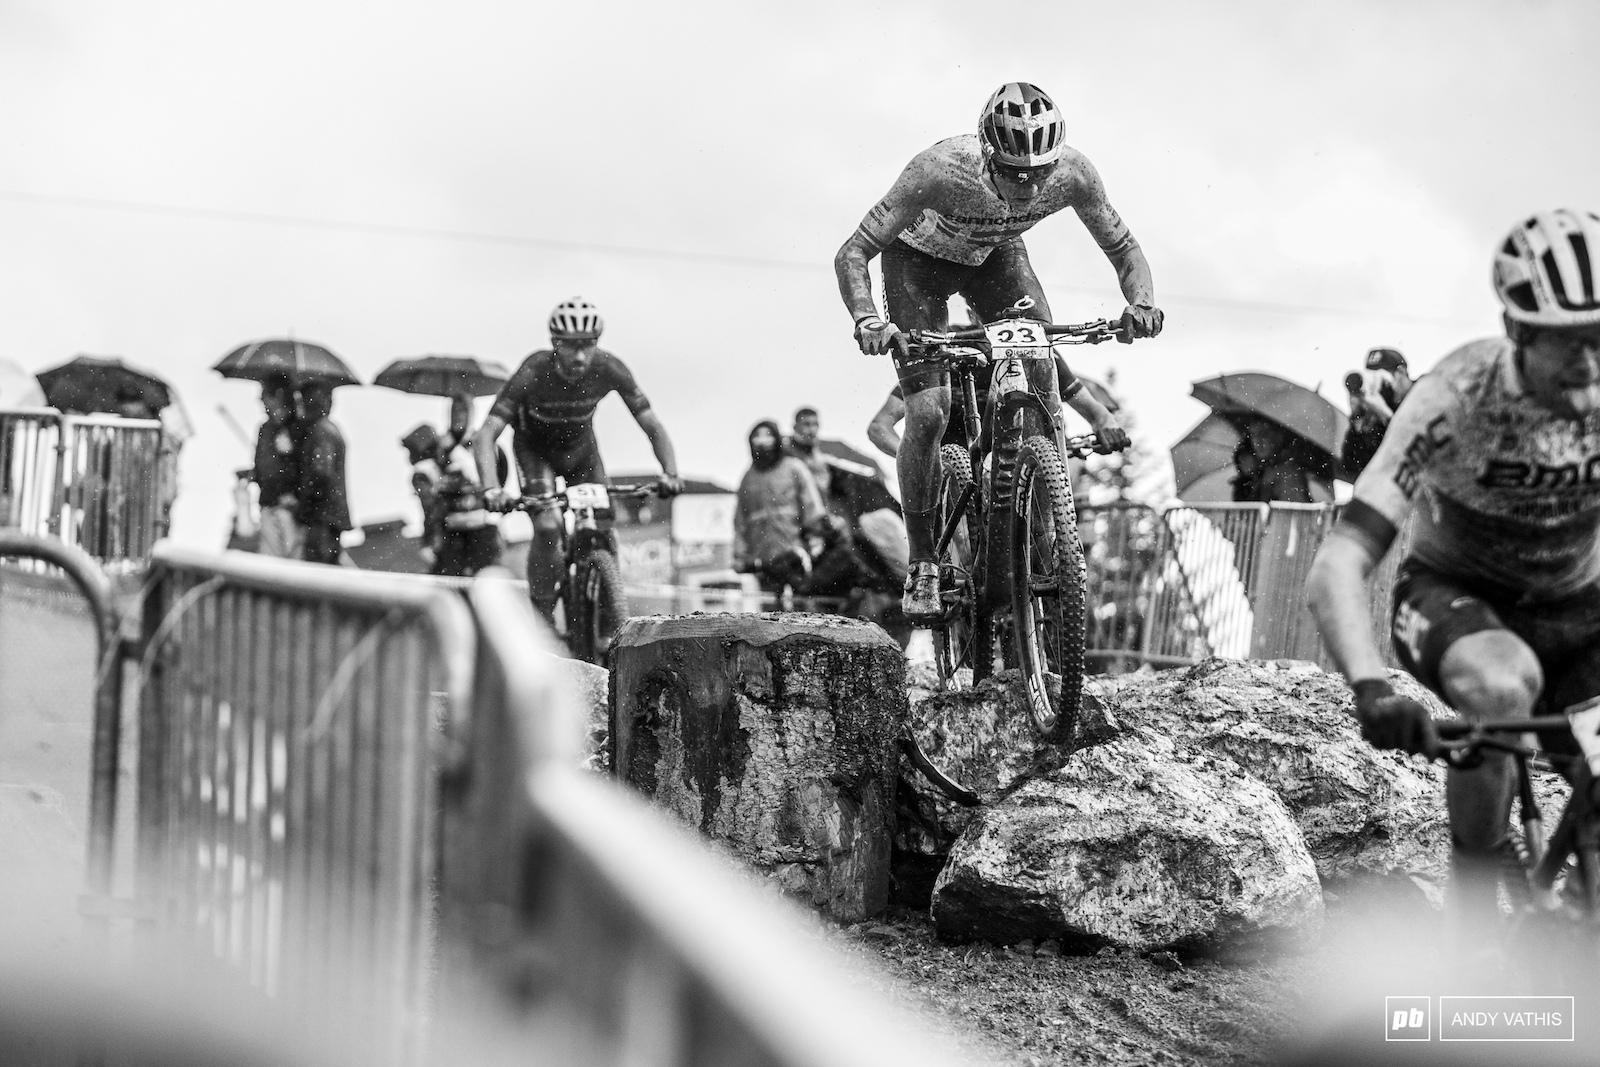 Seventh for Simon Andreassen in the deluge.